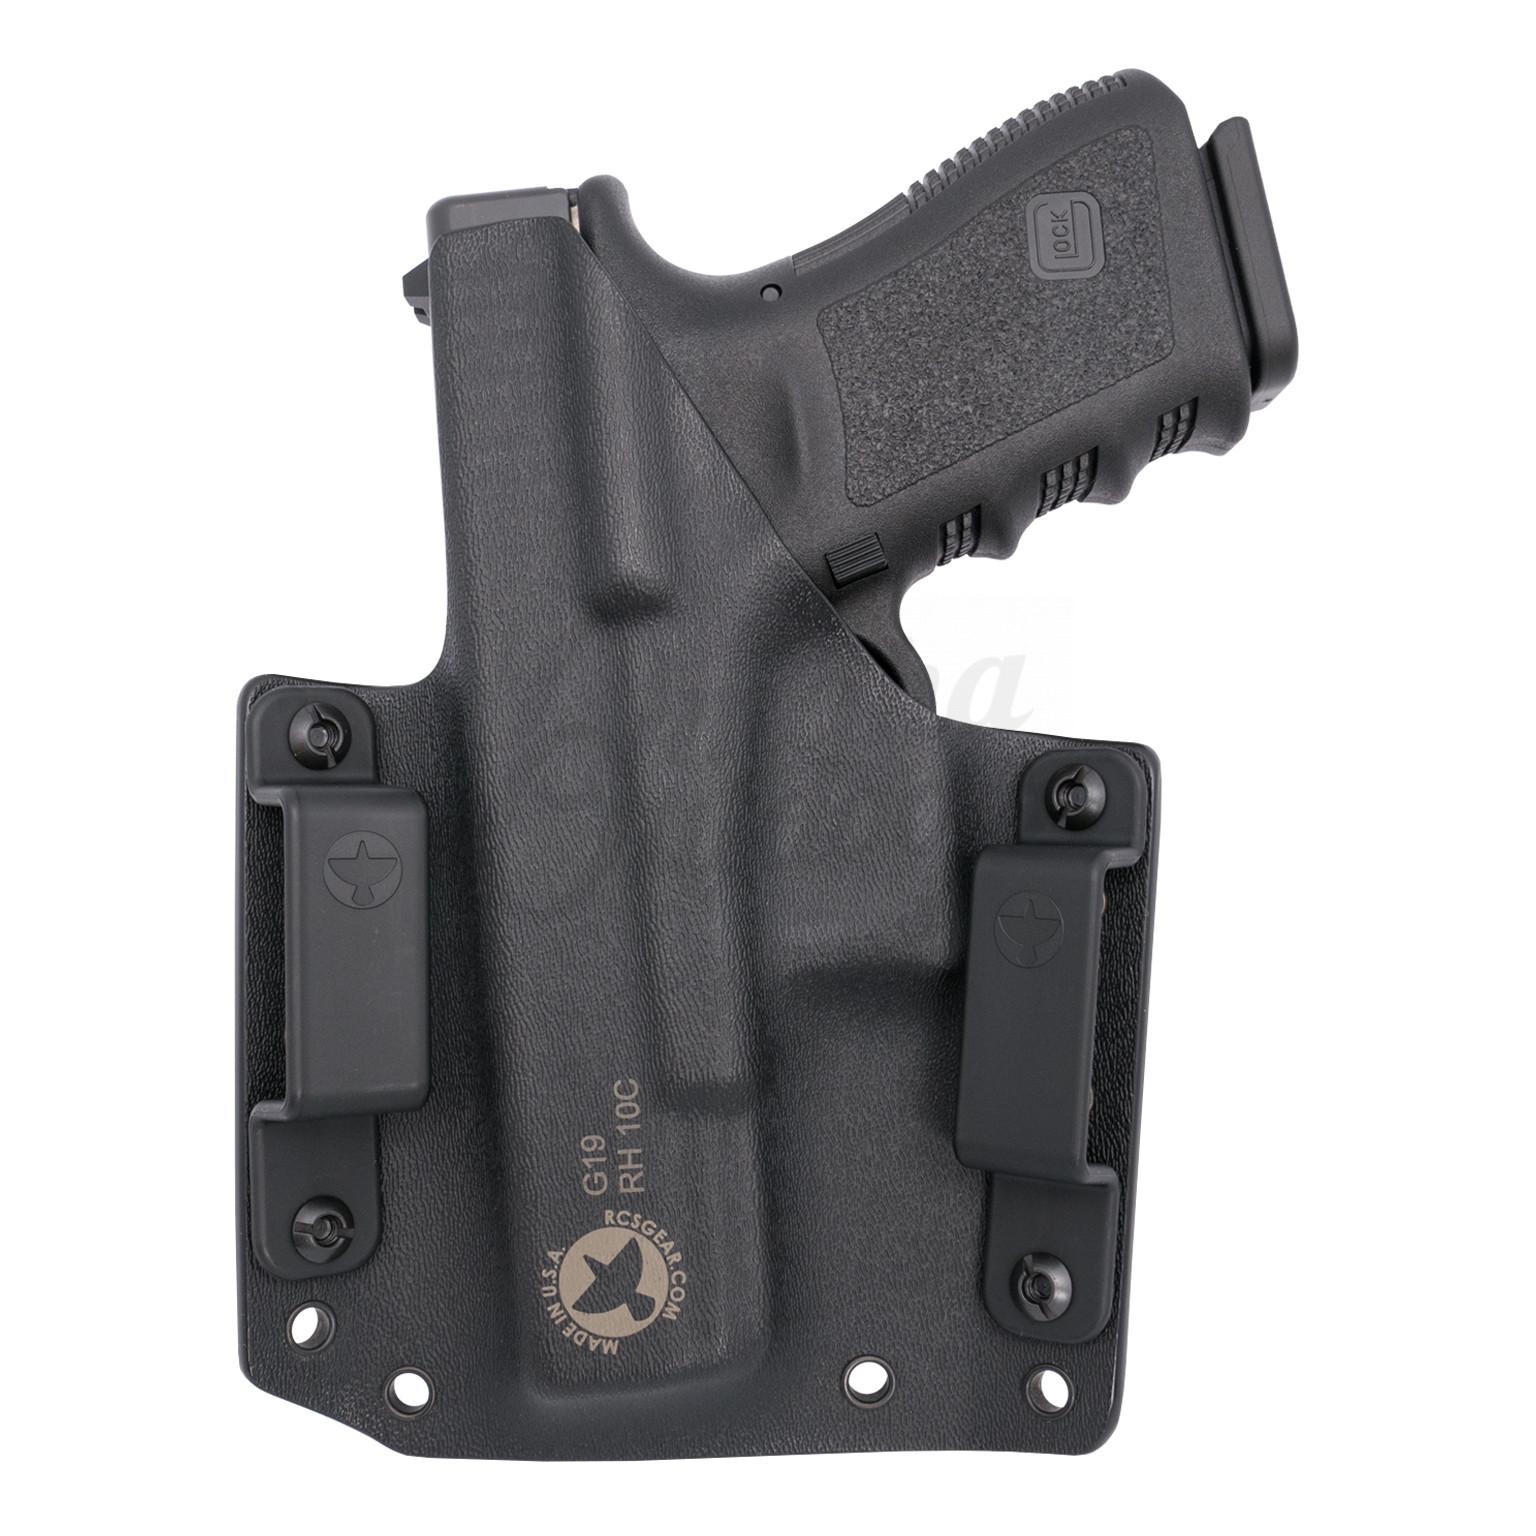 Raven Concealment Phantom OWB Holster Glock 19, 23, 32 Right Hand 1 5″ Kydex